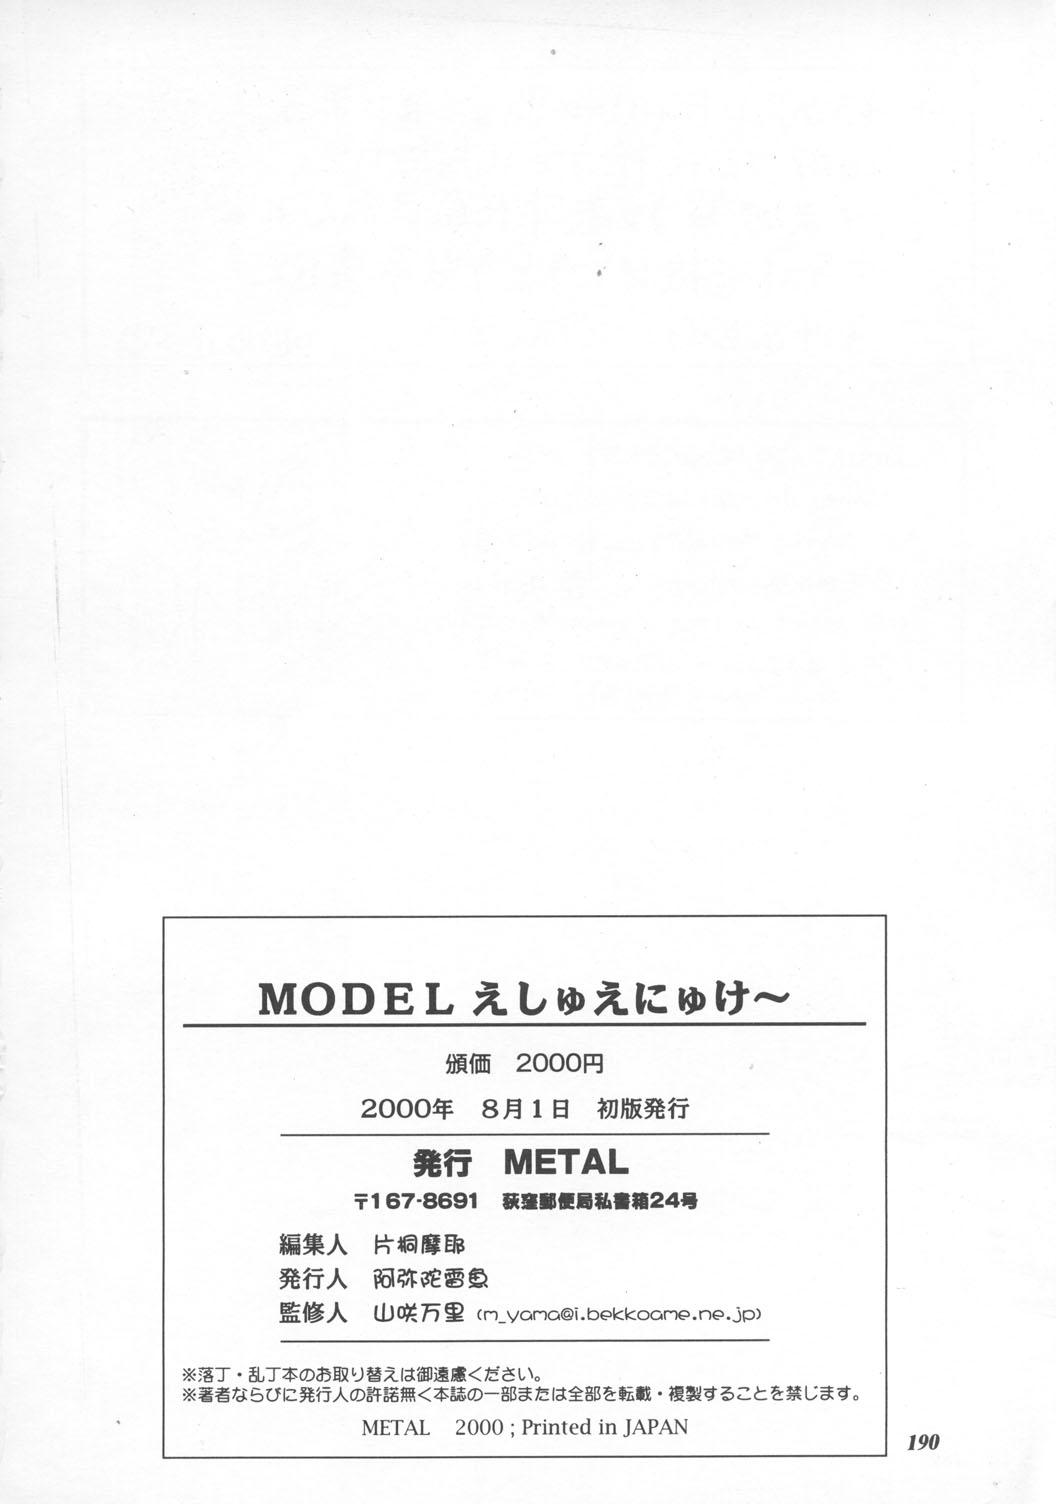 MODEL SNK 188